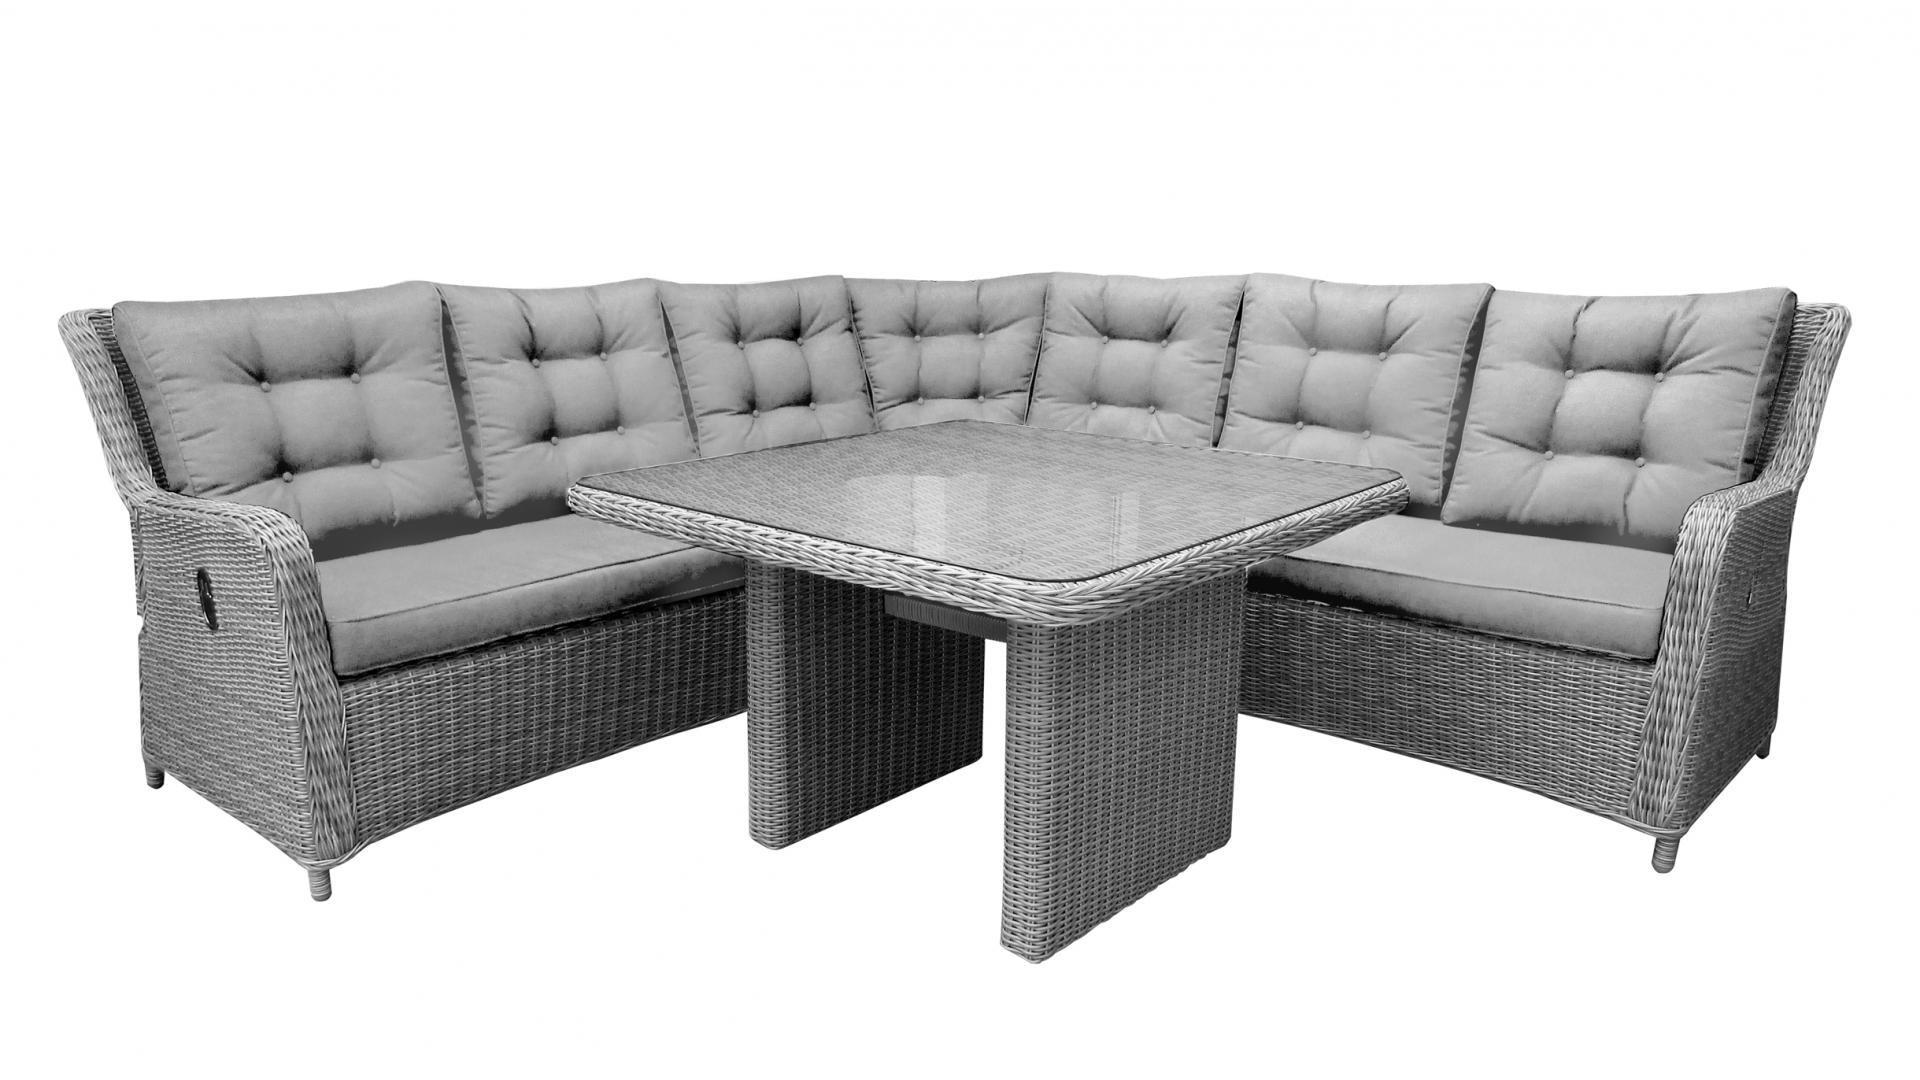 Atlantis Outdoor Wicker Recliner Corner Lounge With Table